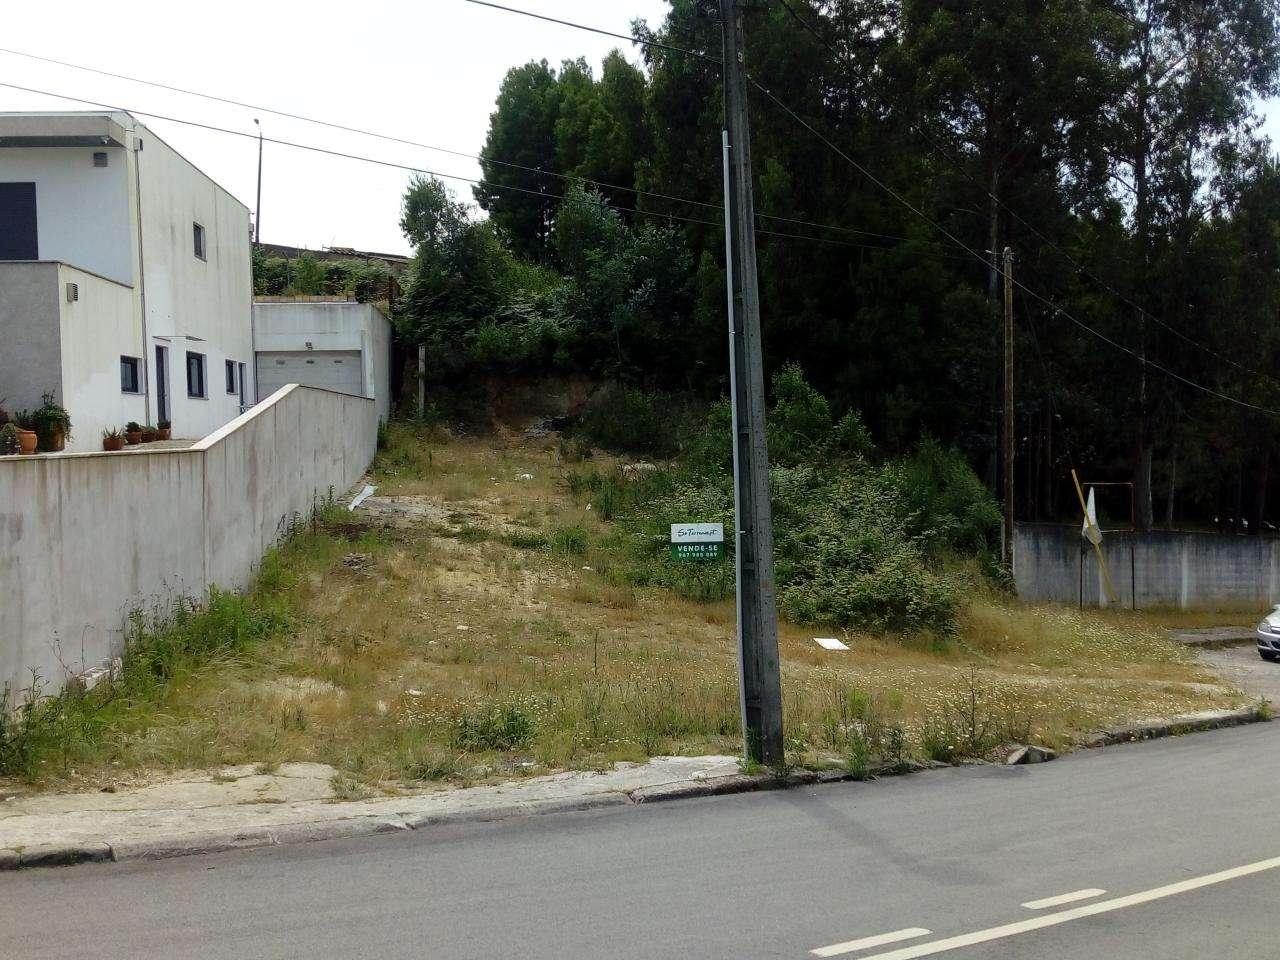 Terreno para comprar, Santa Maria da Feira, Travanca, Sanfins e Espargo, Aveiro - Foto 2